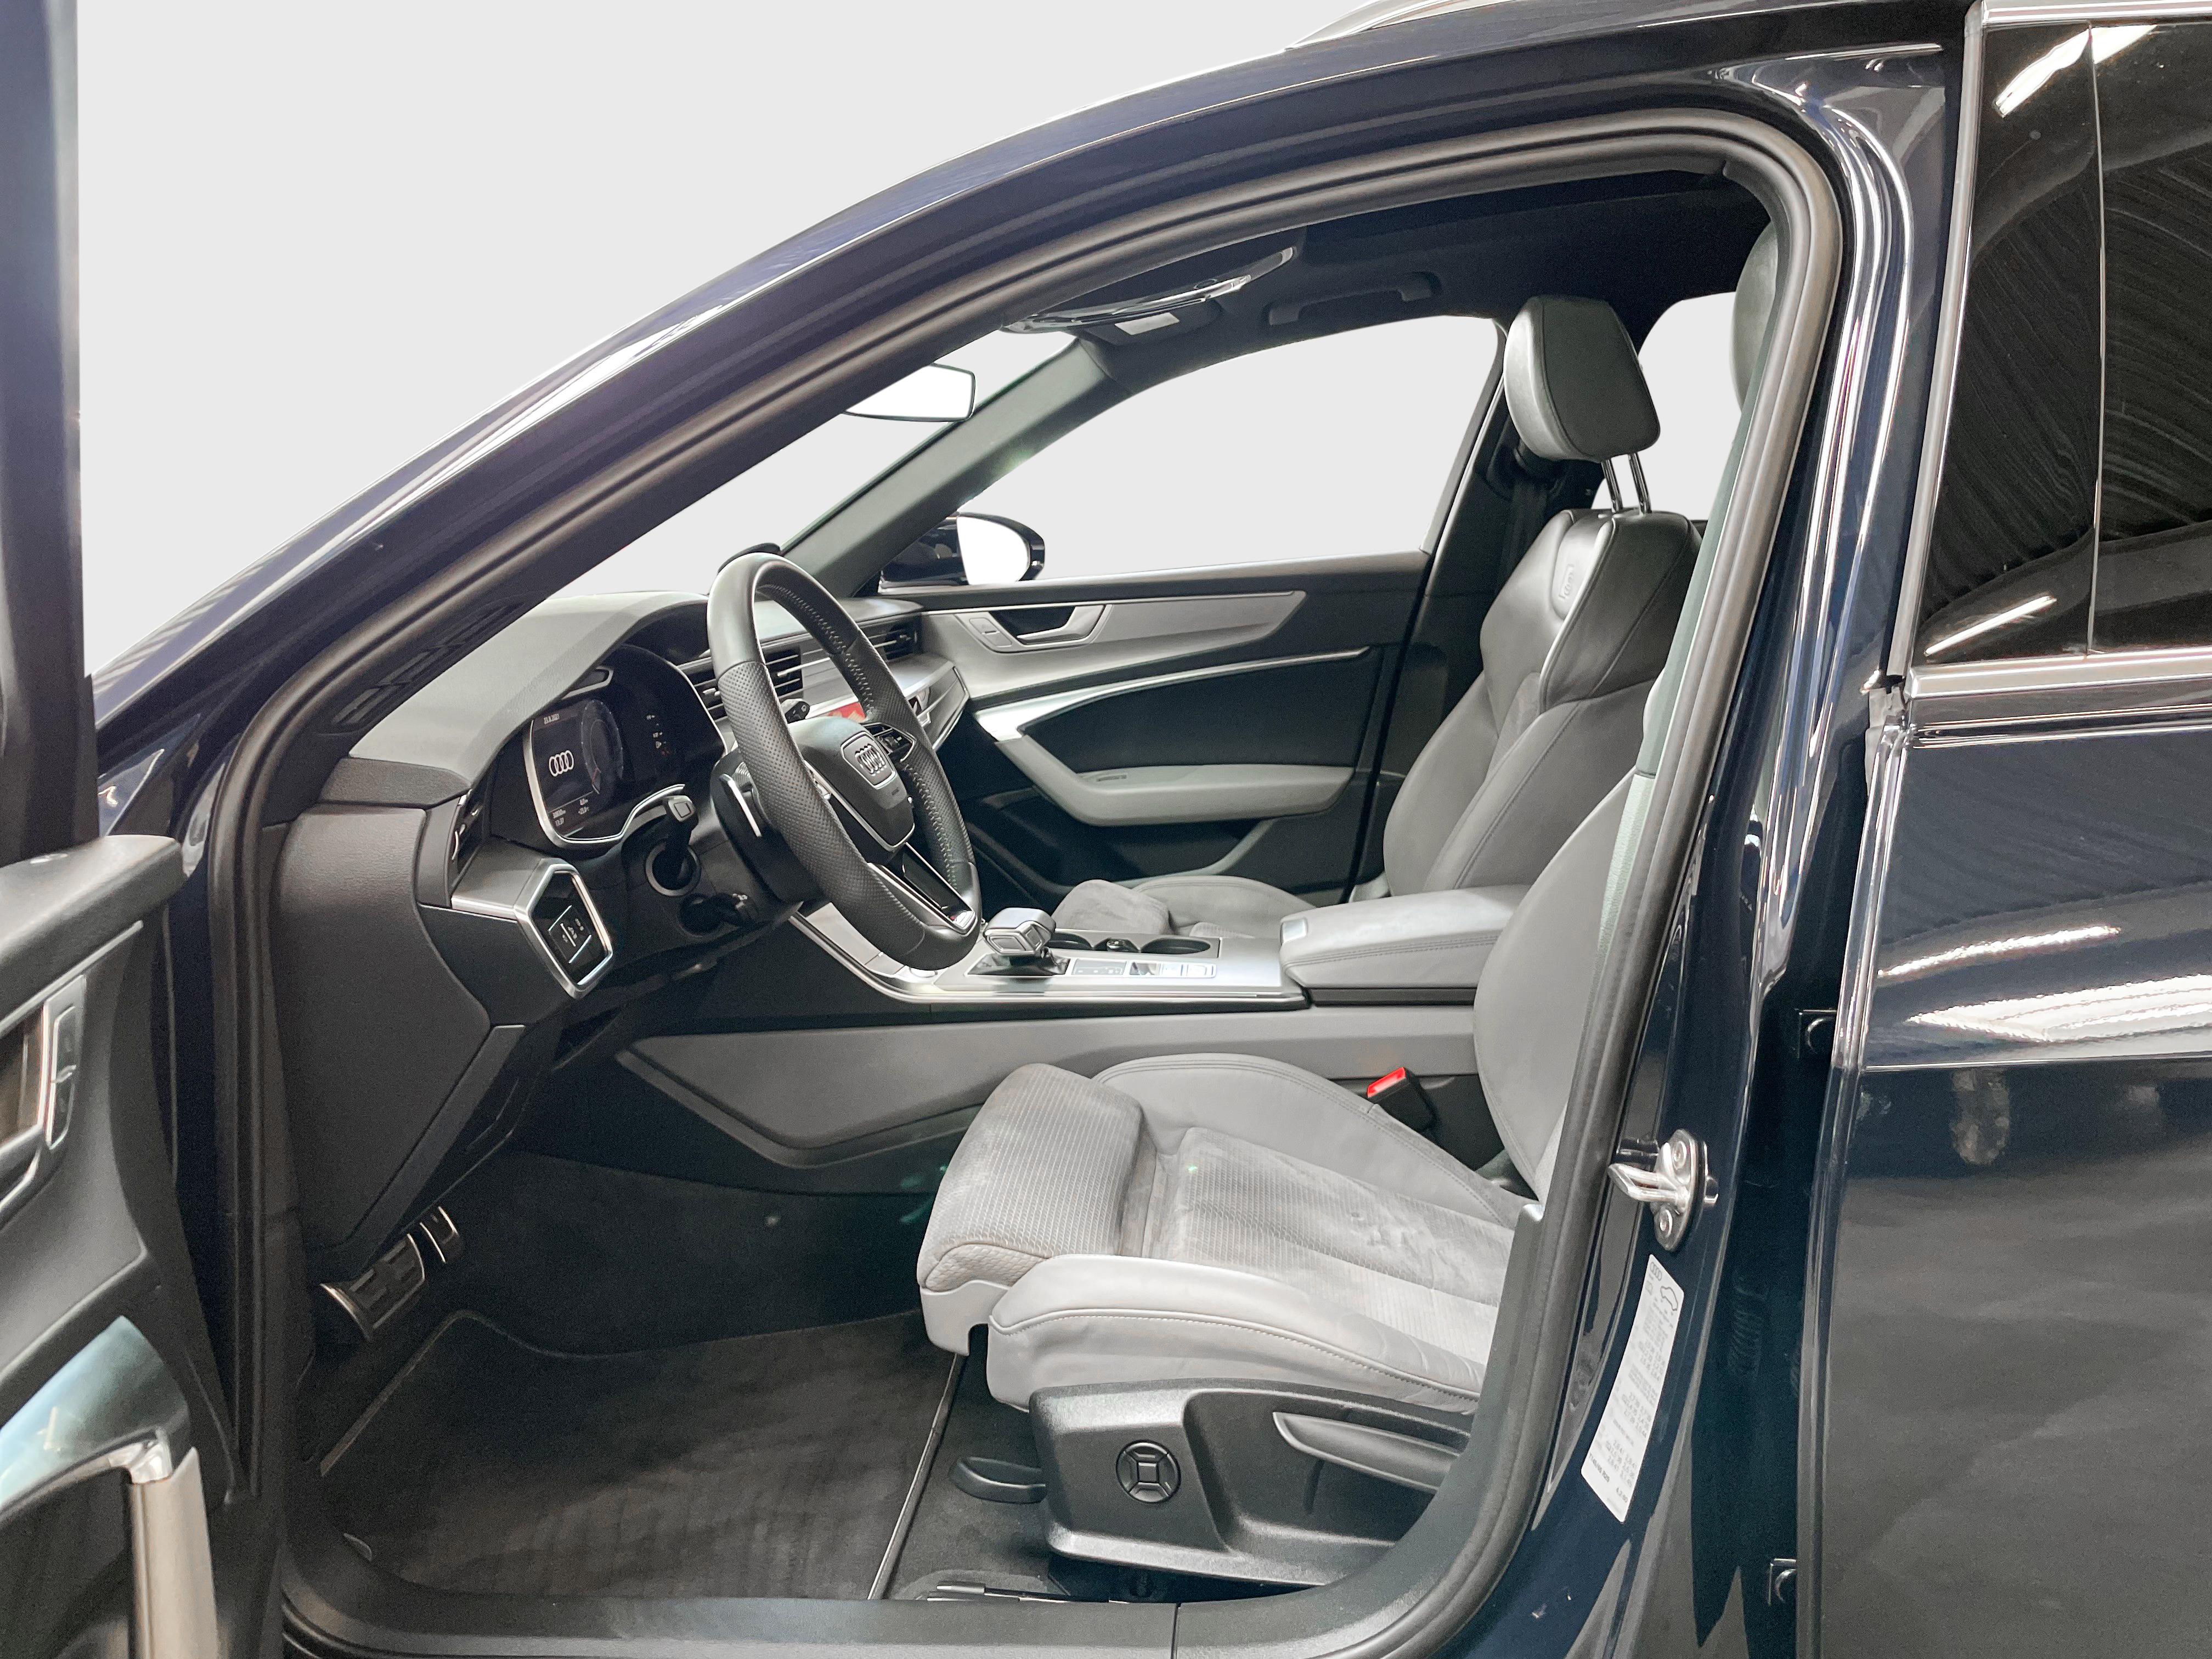 Avant 2,0 TDI  Mild hybrid S Tronic 204HK Stc 7g Aut. image3